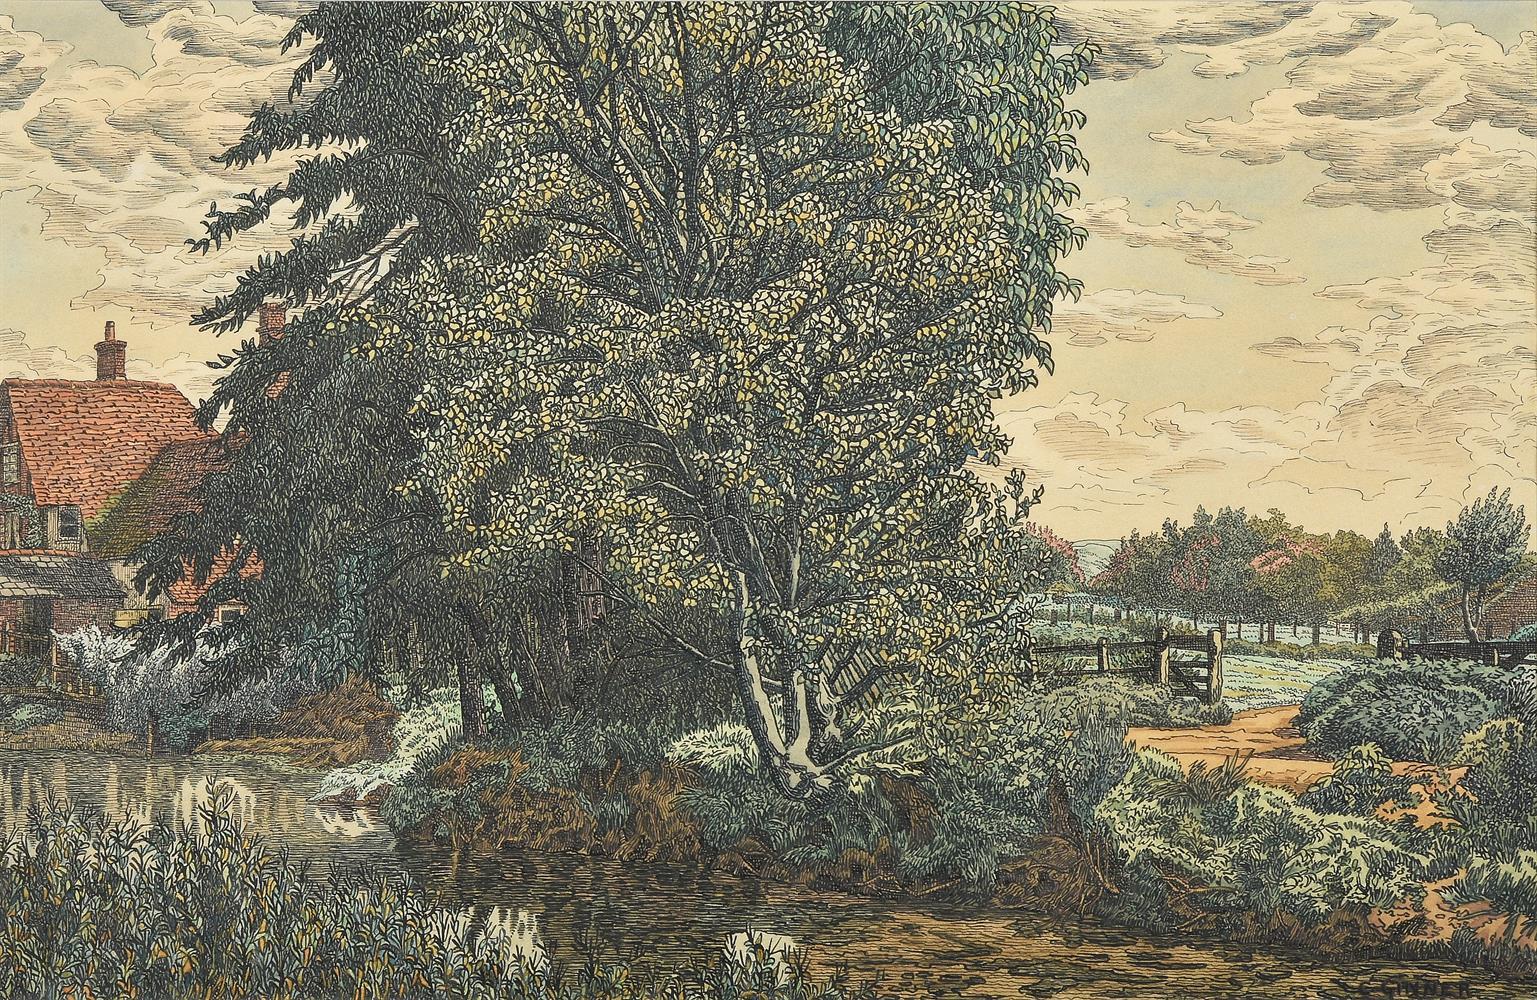 Charles Ginner (British 1878-1952), Country landscape